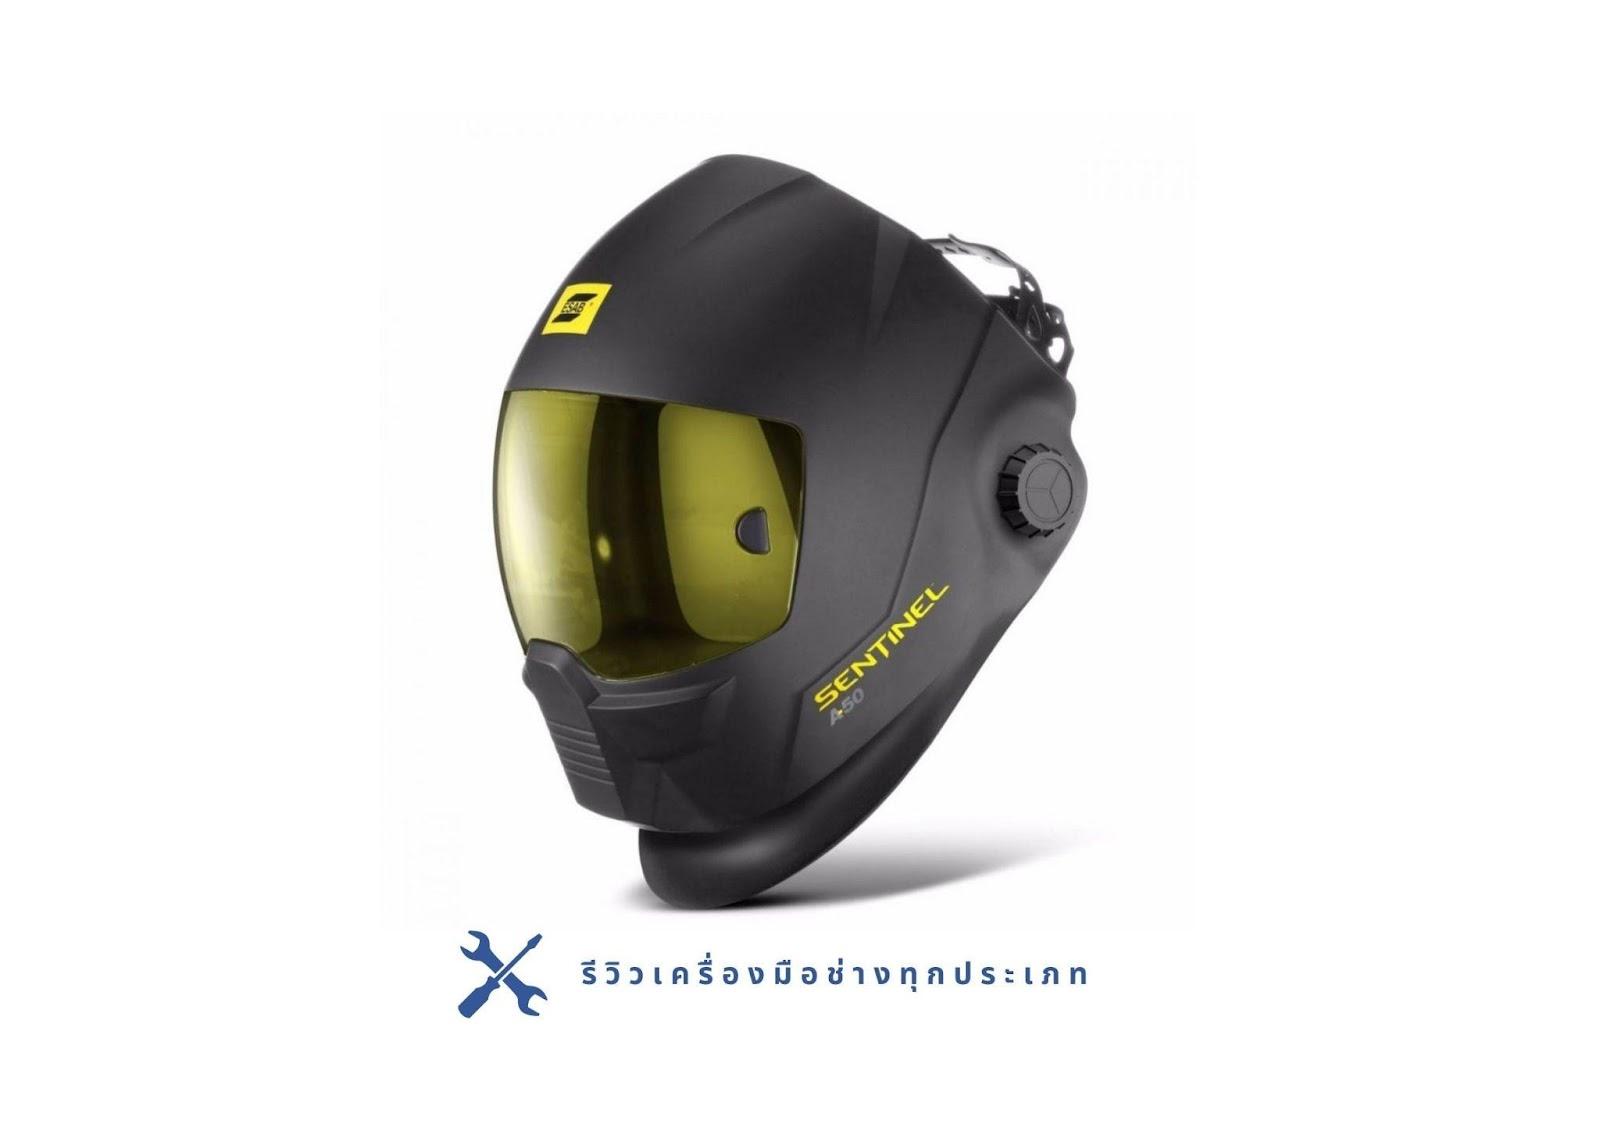 5. Esab SENTINEL A50 Auto Dark Welding Helmet Welding